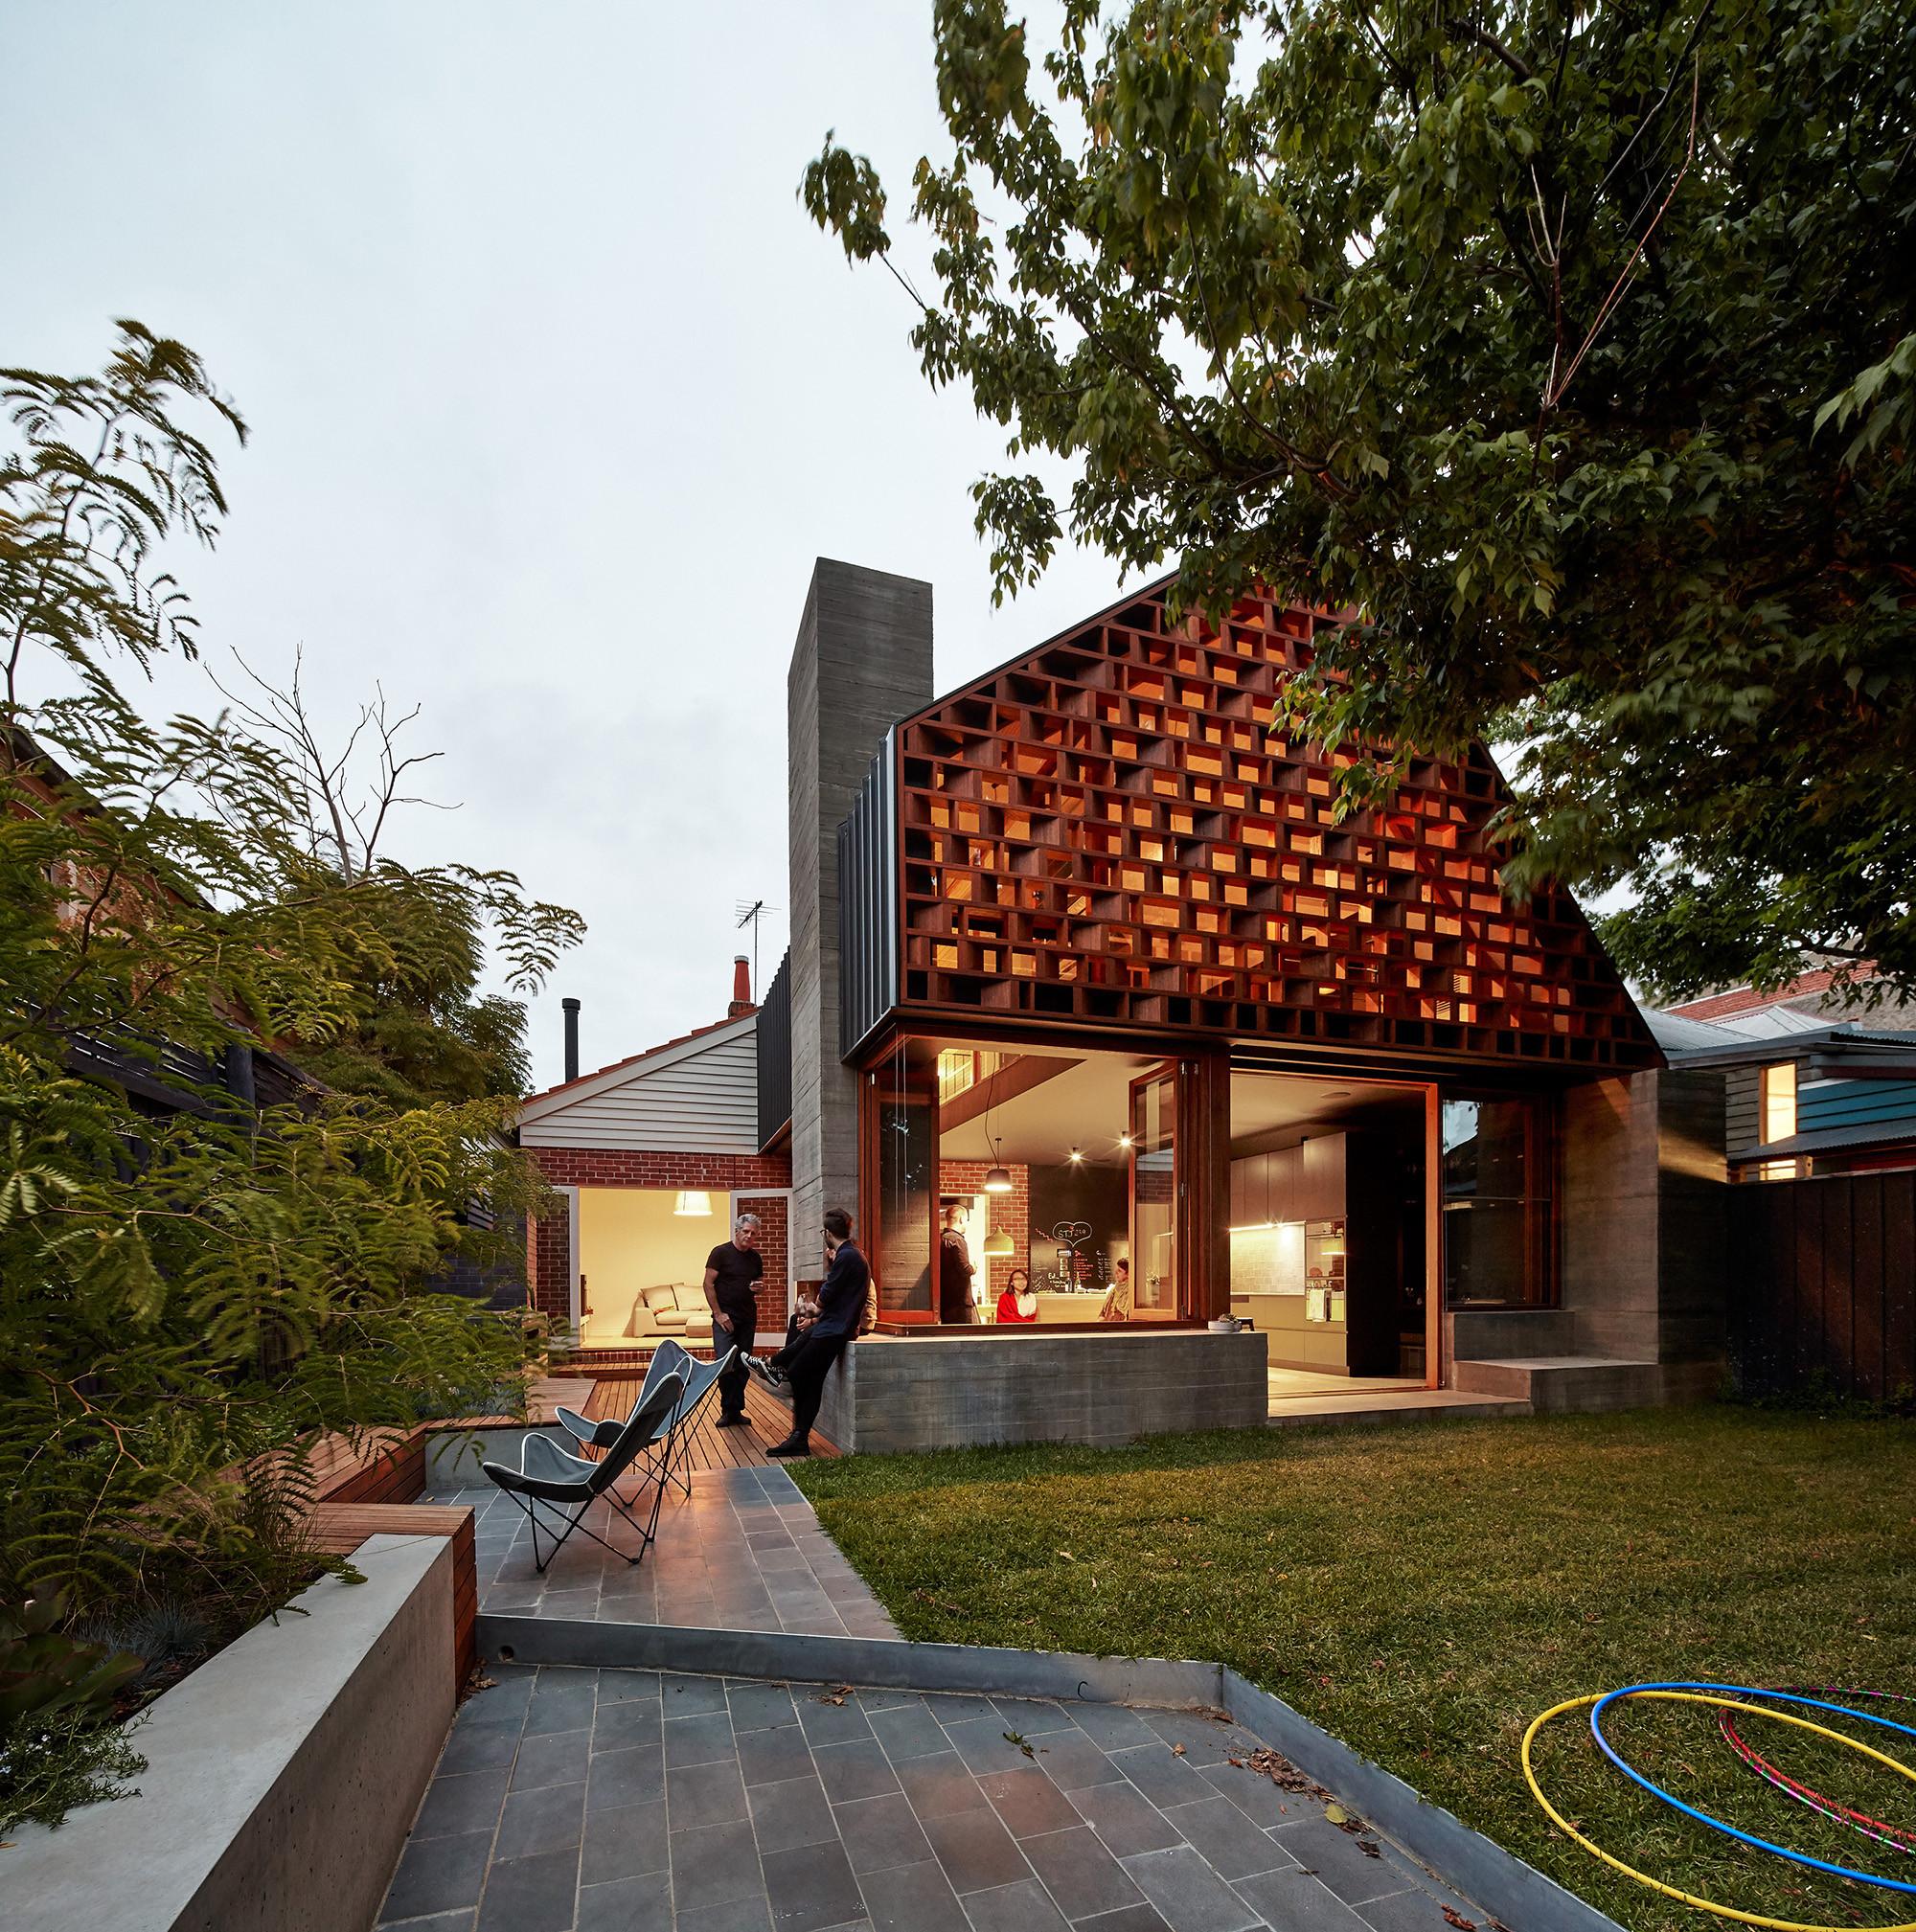 Home Design Ideas Australia: Local House By MAKE Architecture